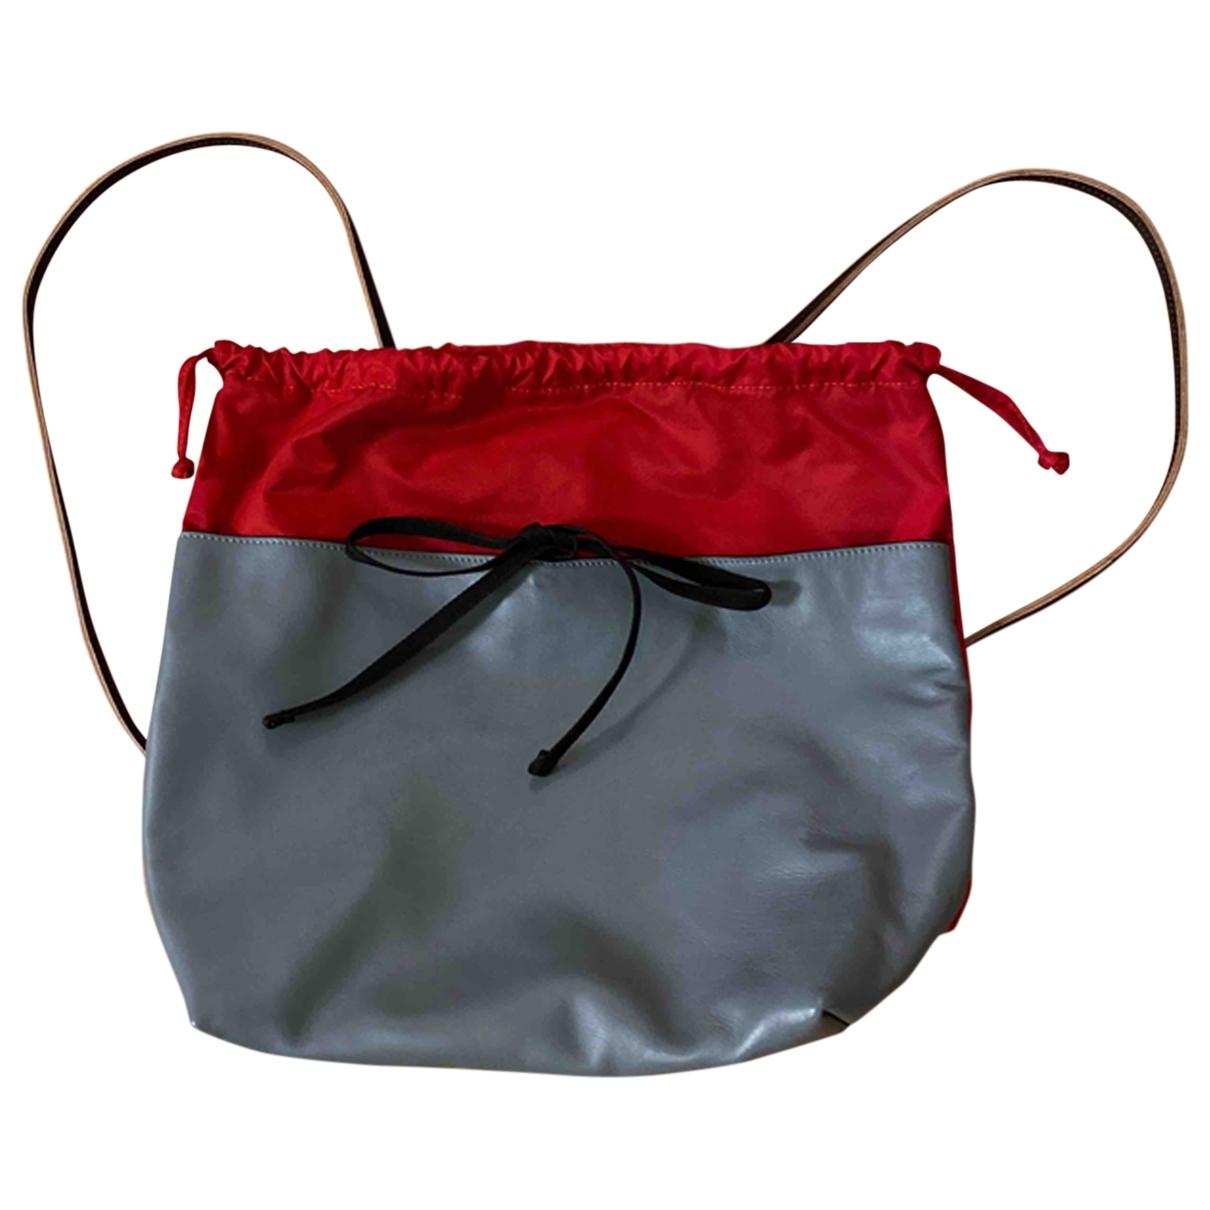 Marni - Sac a dos   pour femme - multicolore